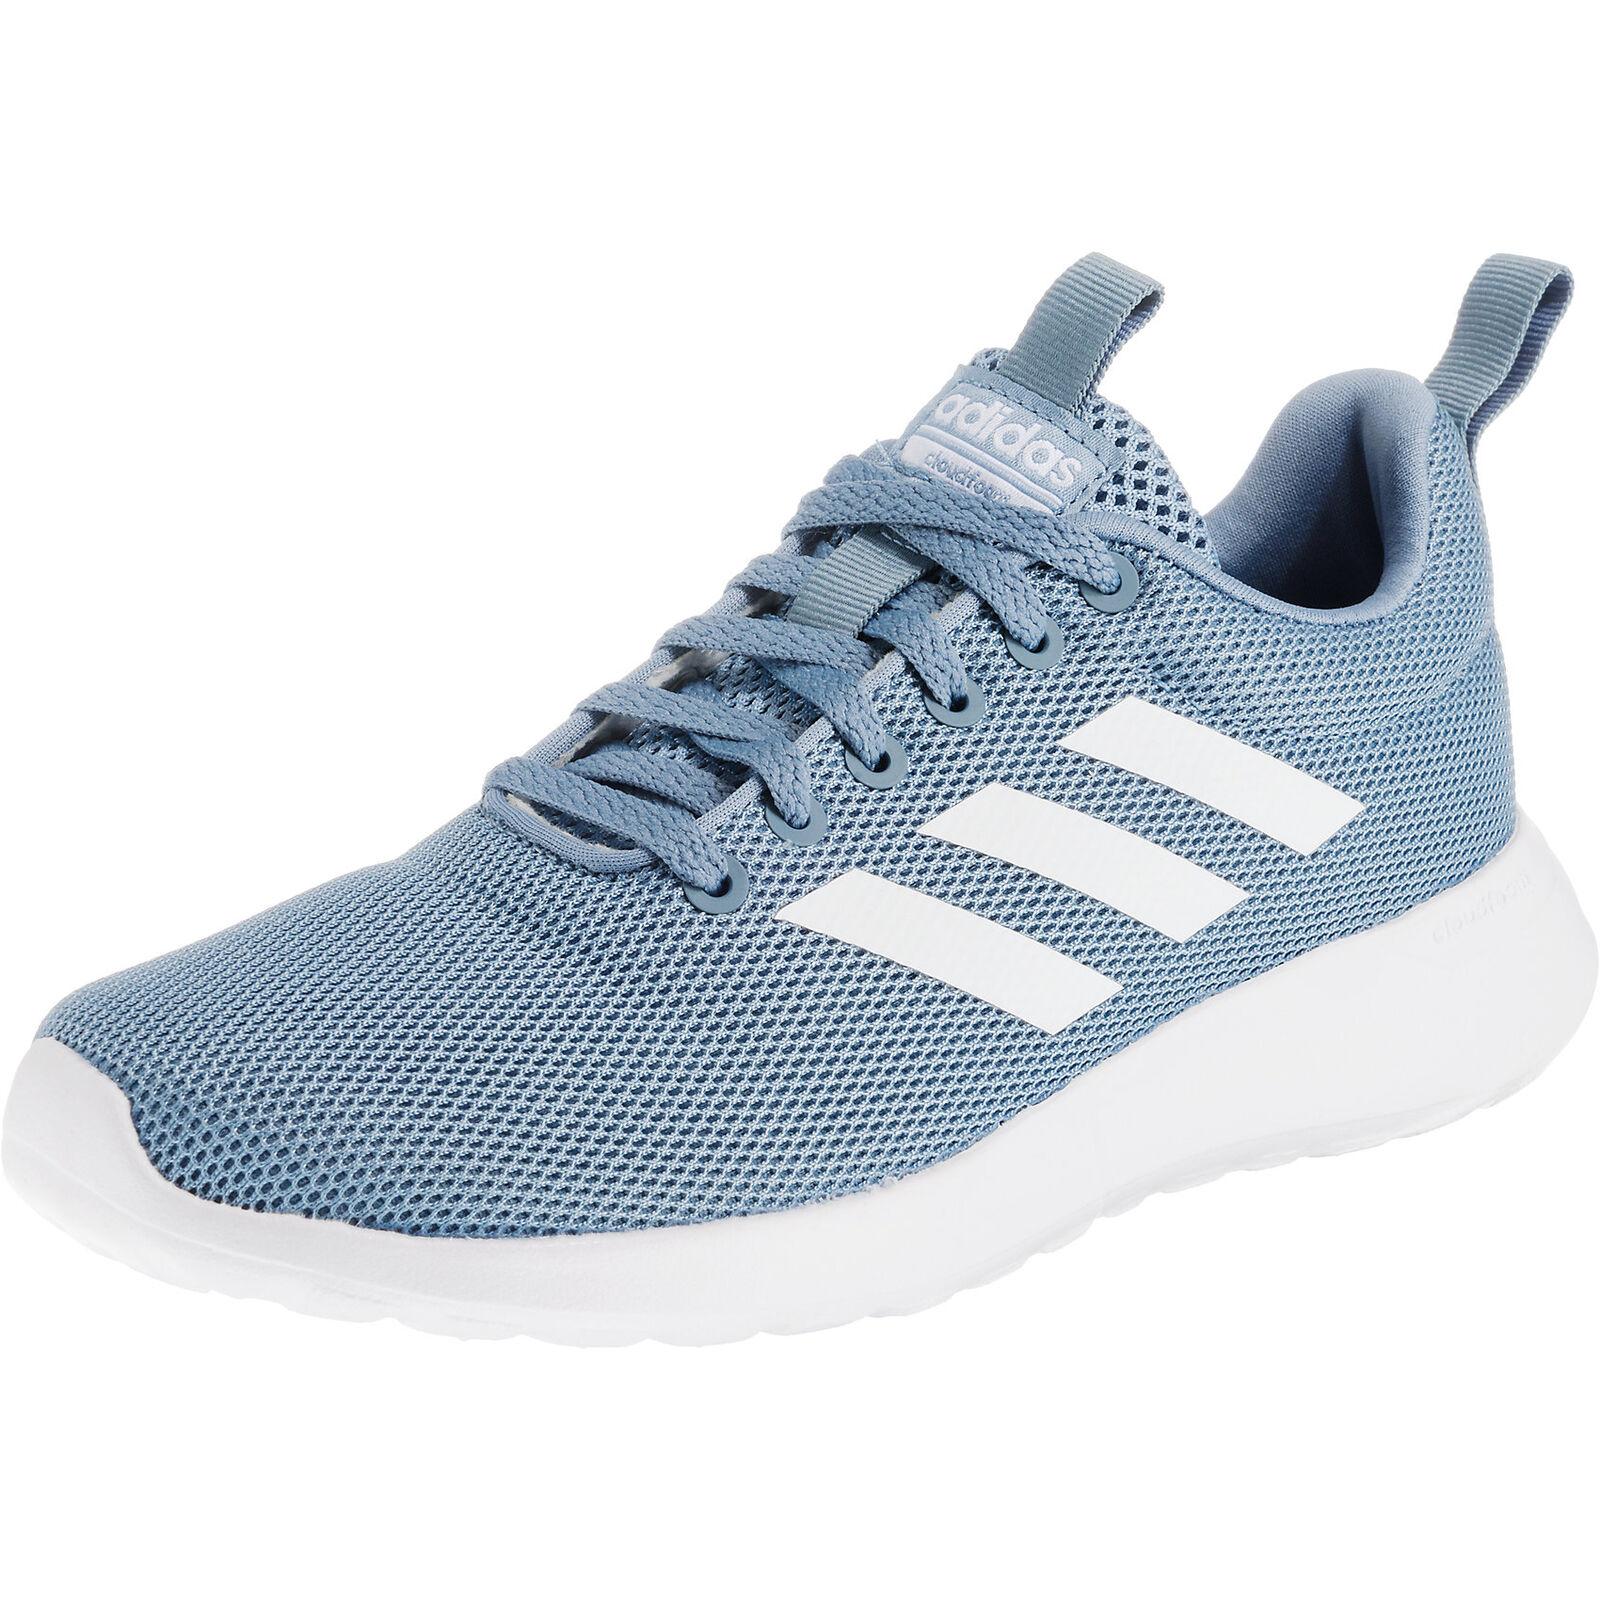 Adidas Gazelle Damen Damen Adidas Boost Clima Chill Weave Schuhe hell Blau